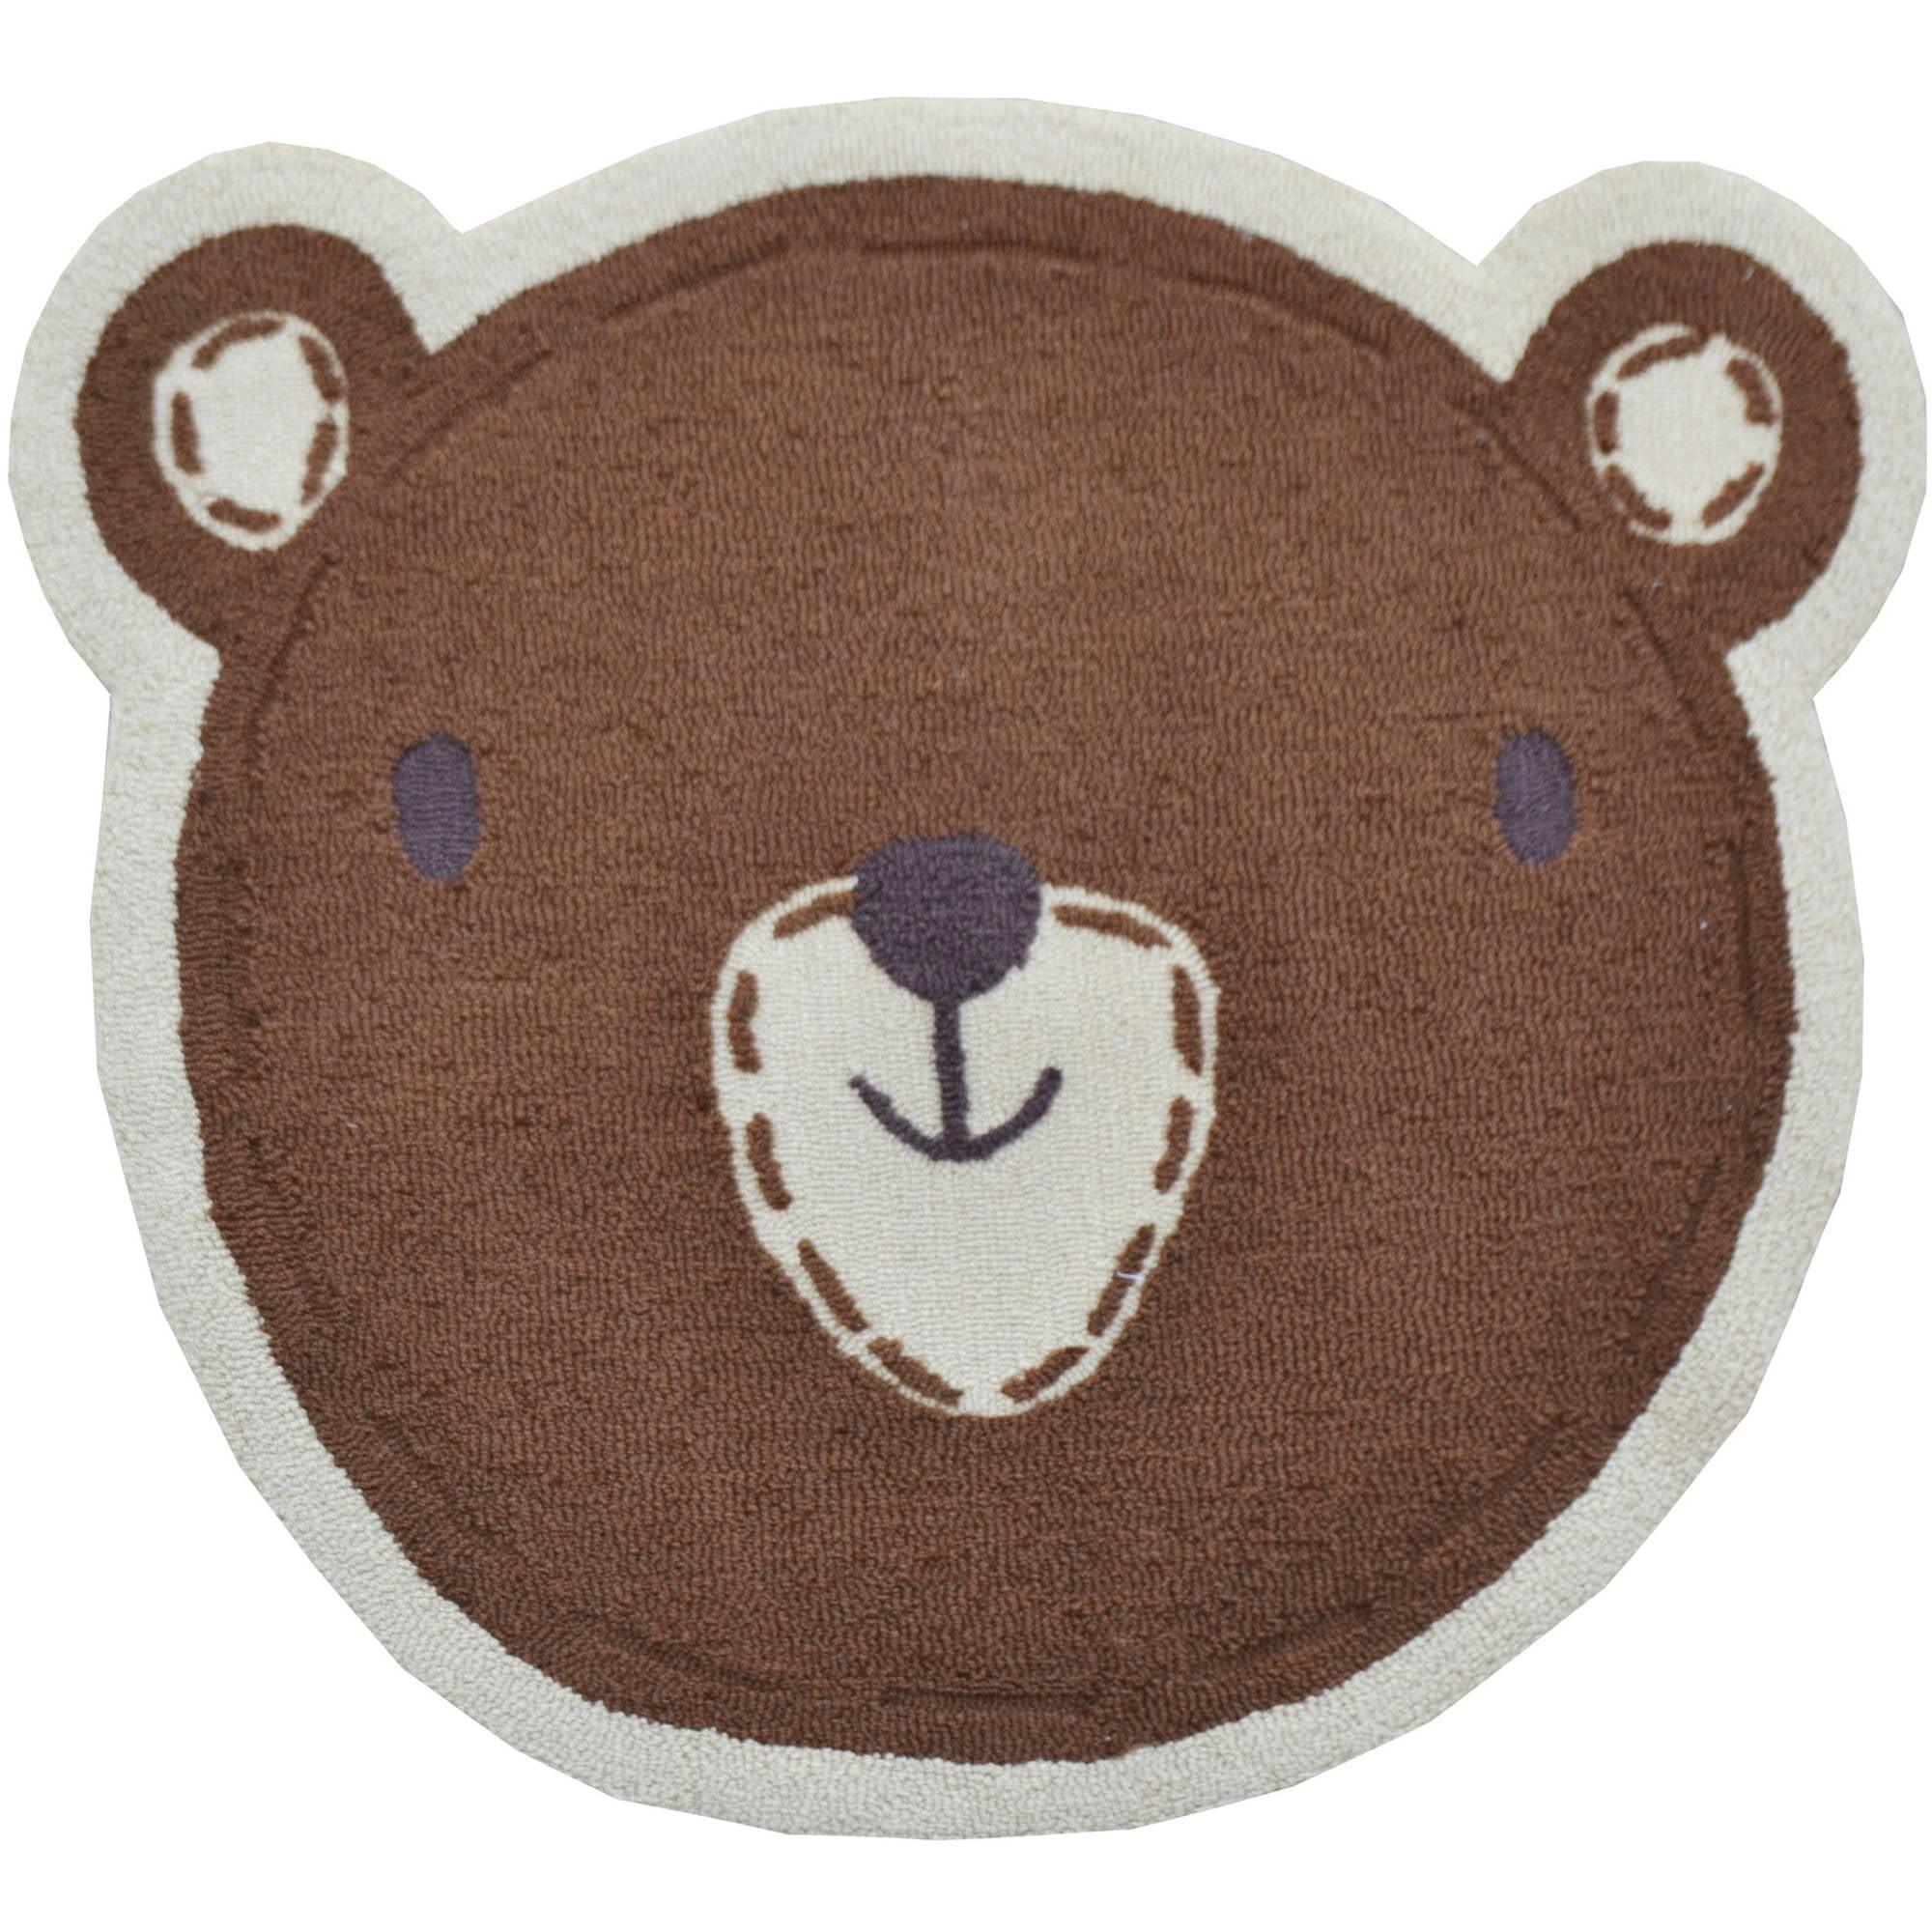 "The Rug Market Shaped Bear Face 3"" x 3"" Area Rug"